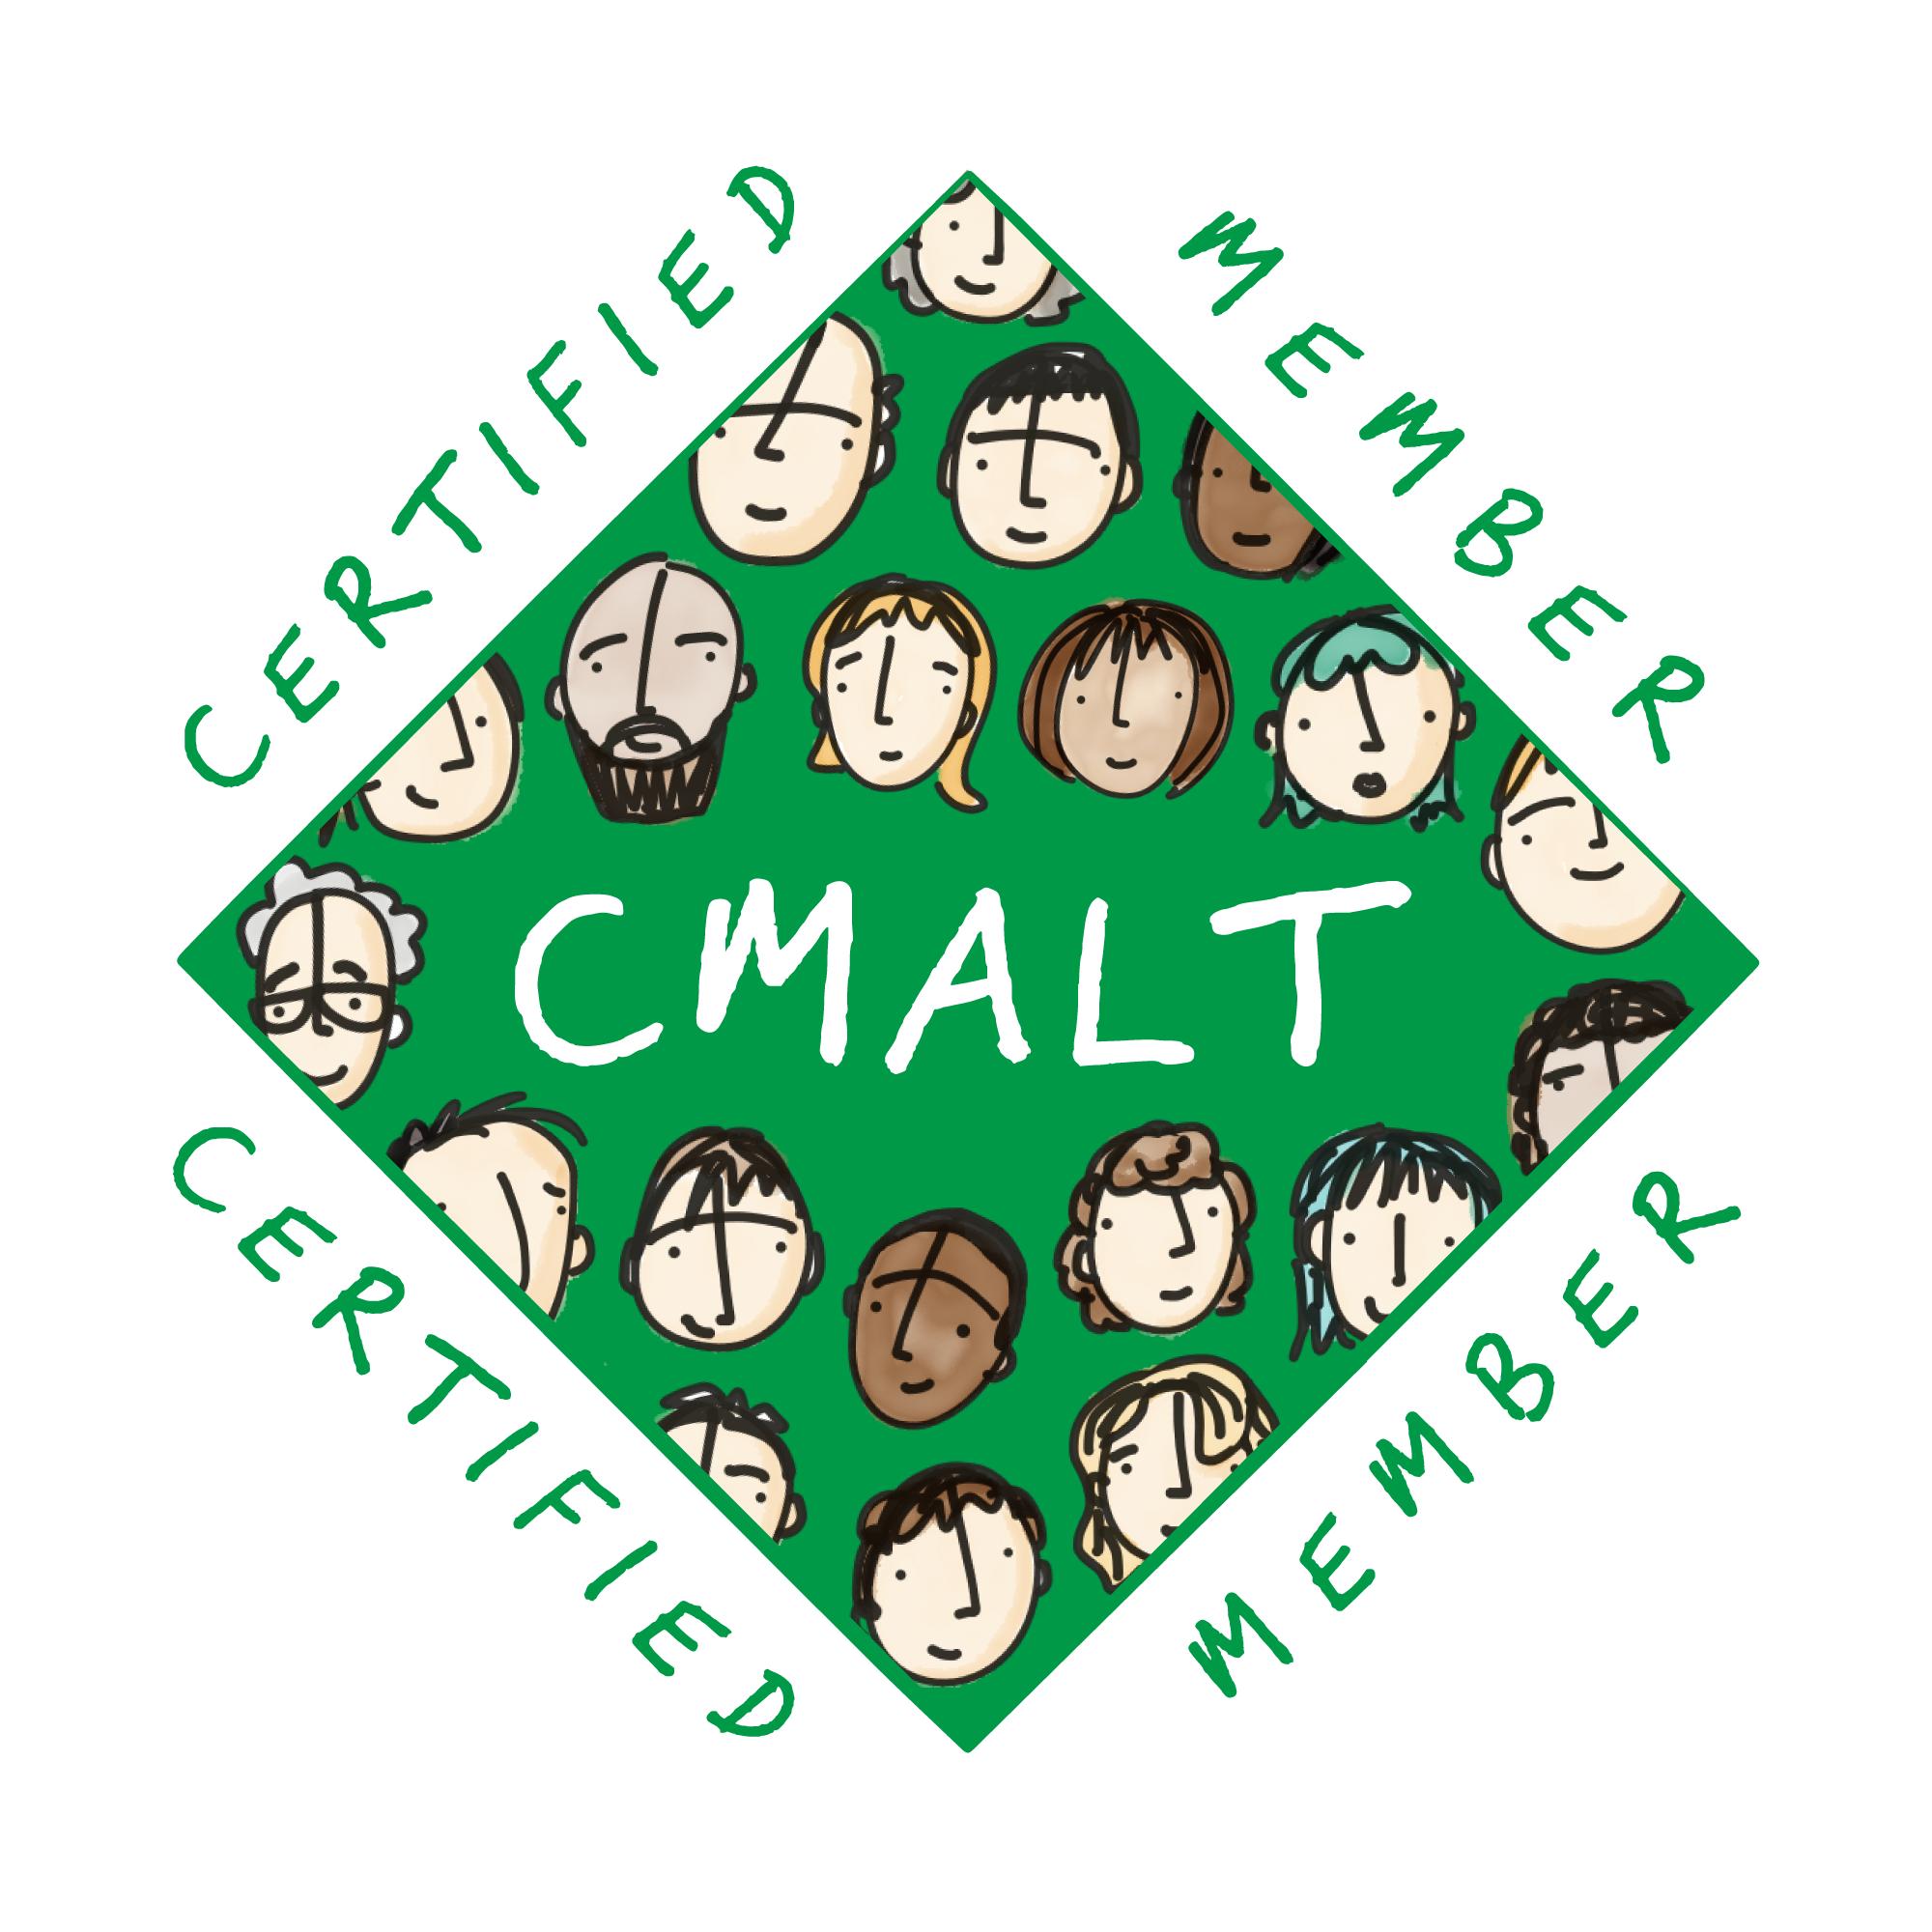 Certified Membership (CMALT)